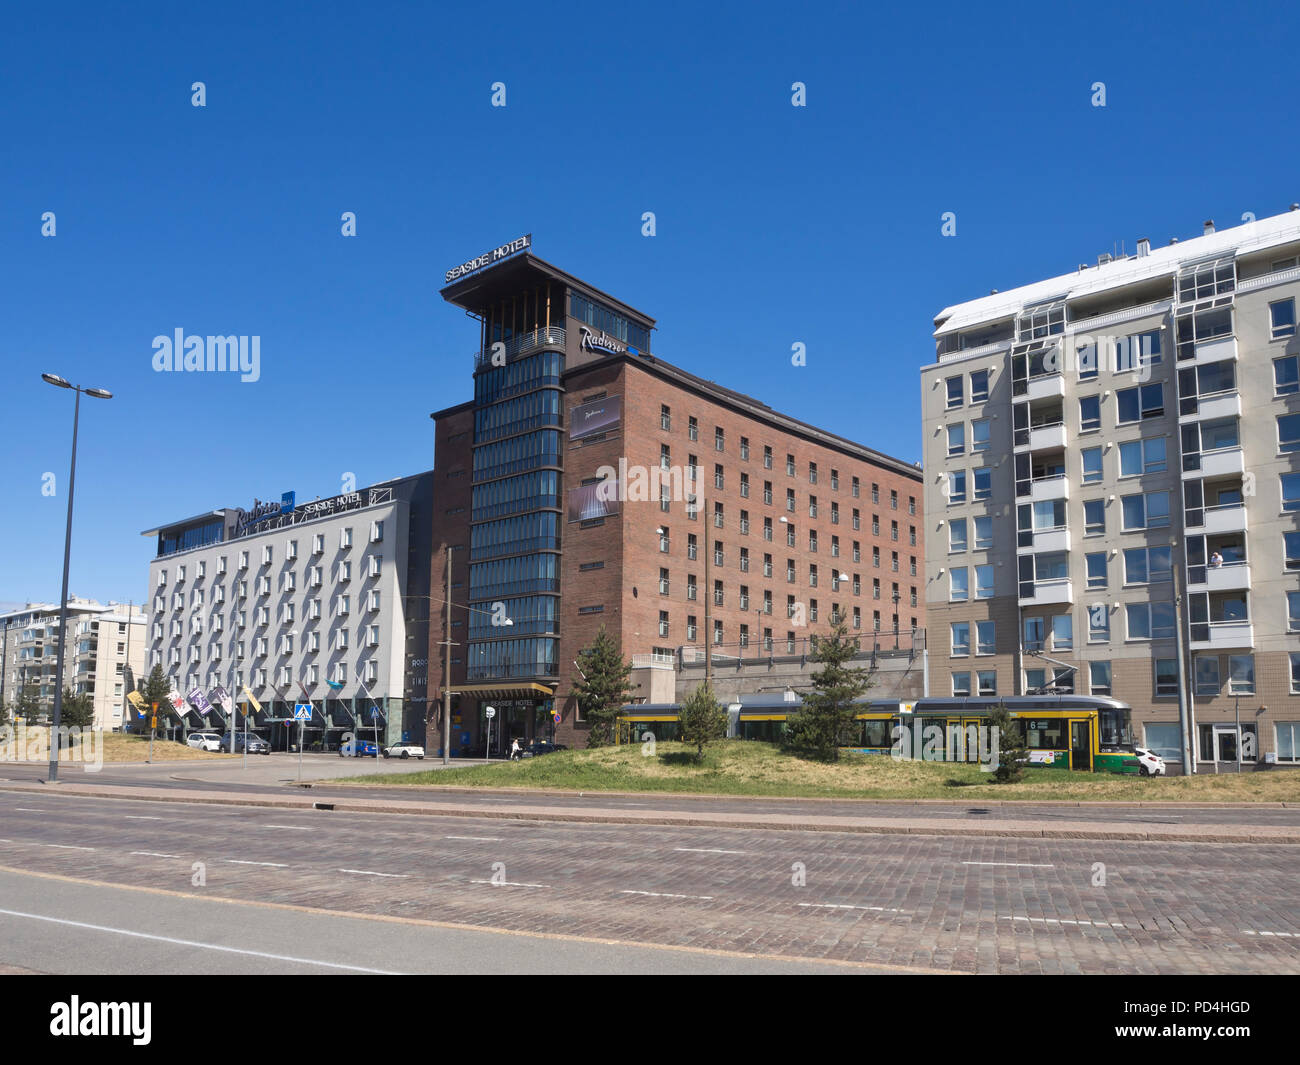 Radisson Blu Seaside Hotel four star accommodation in the Hlietalahti district in Helsinki Finland - Stock Image